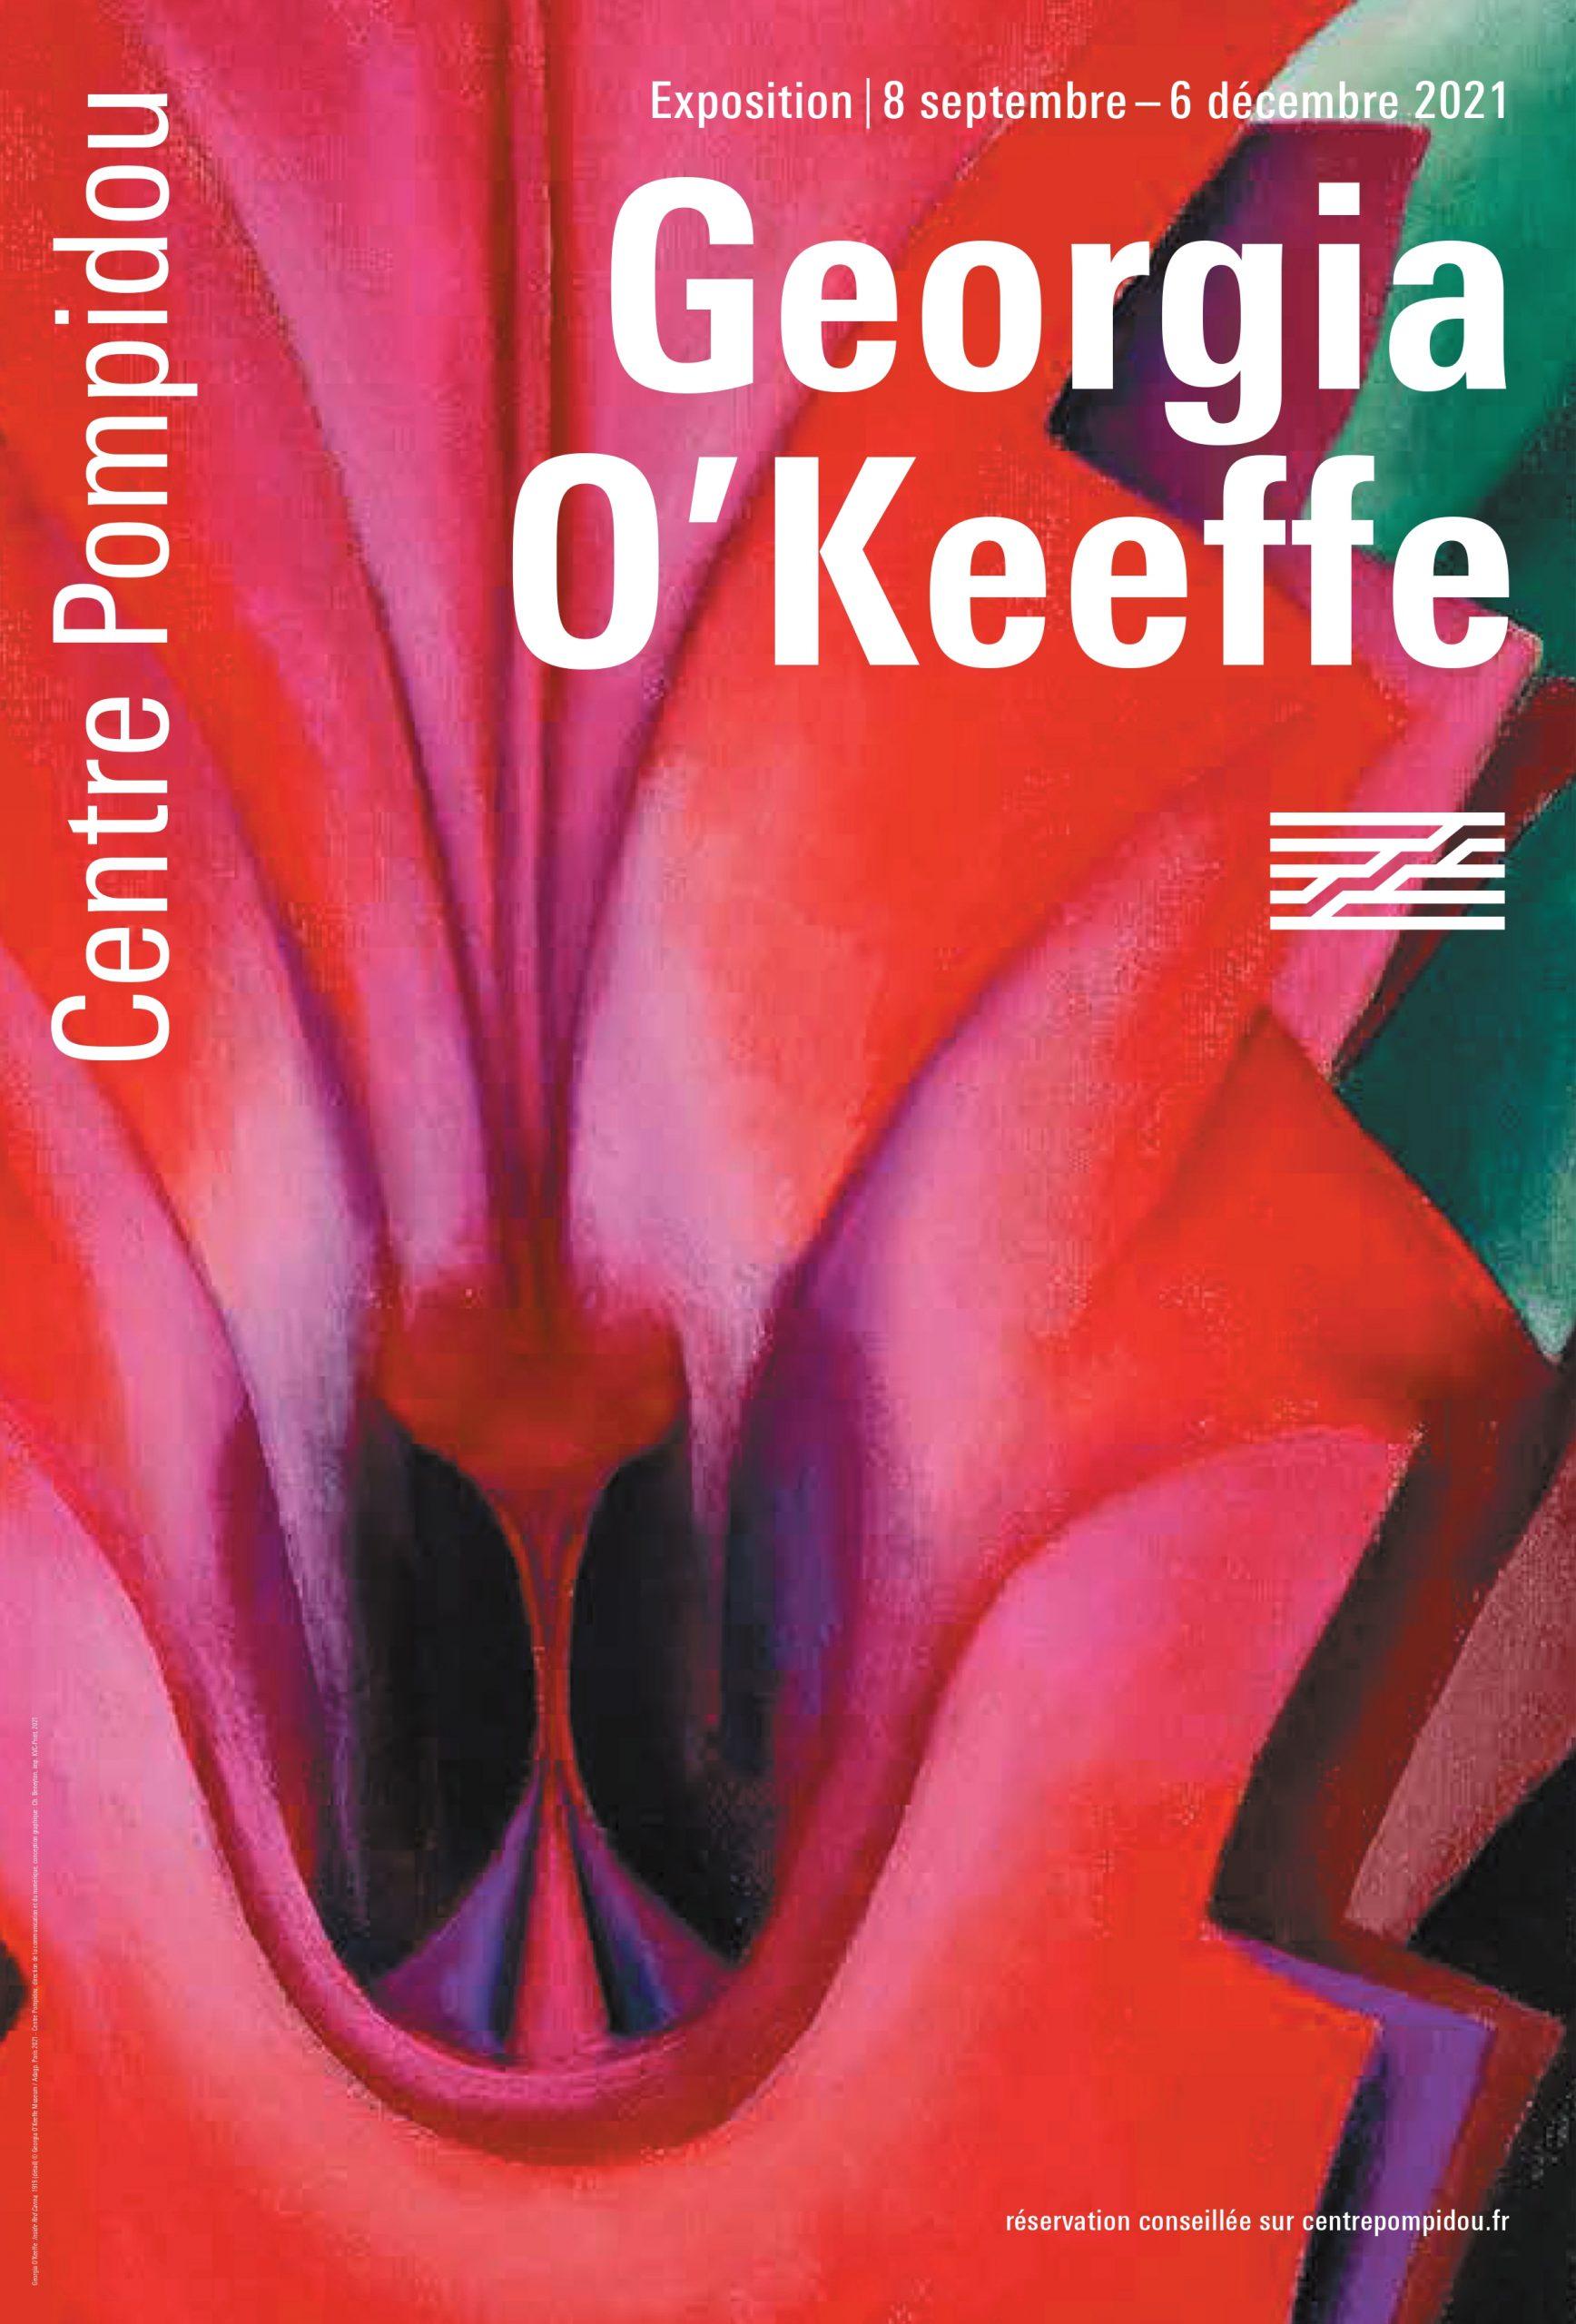 Affiche_Centre Pompidou_O'Keeffe_2021 show